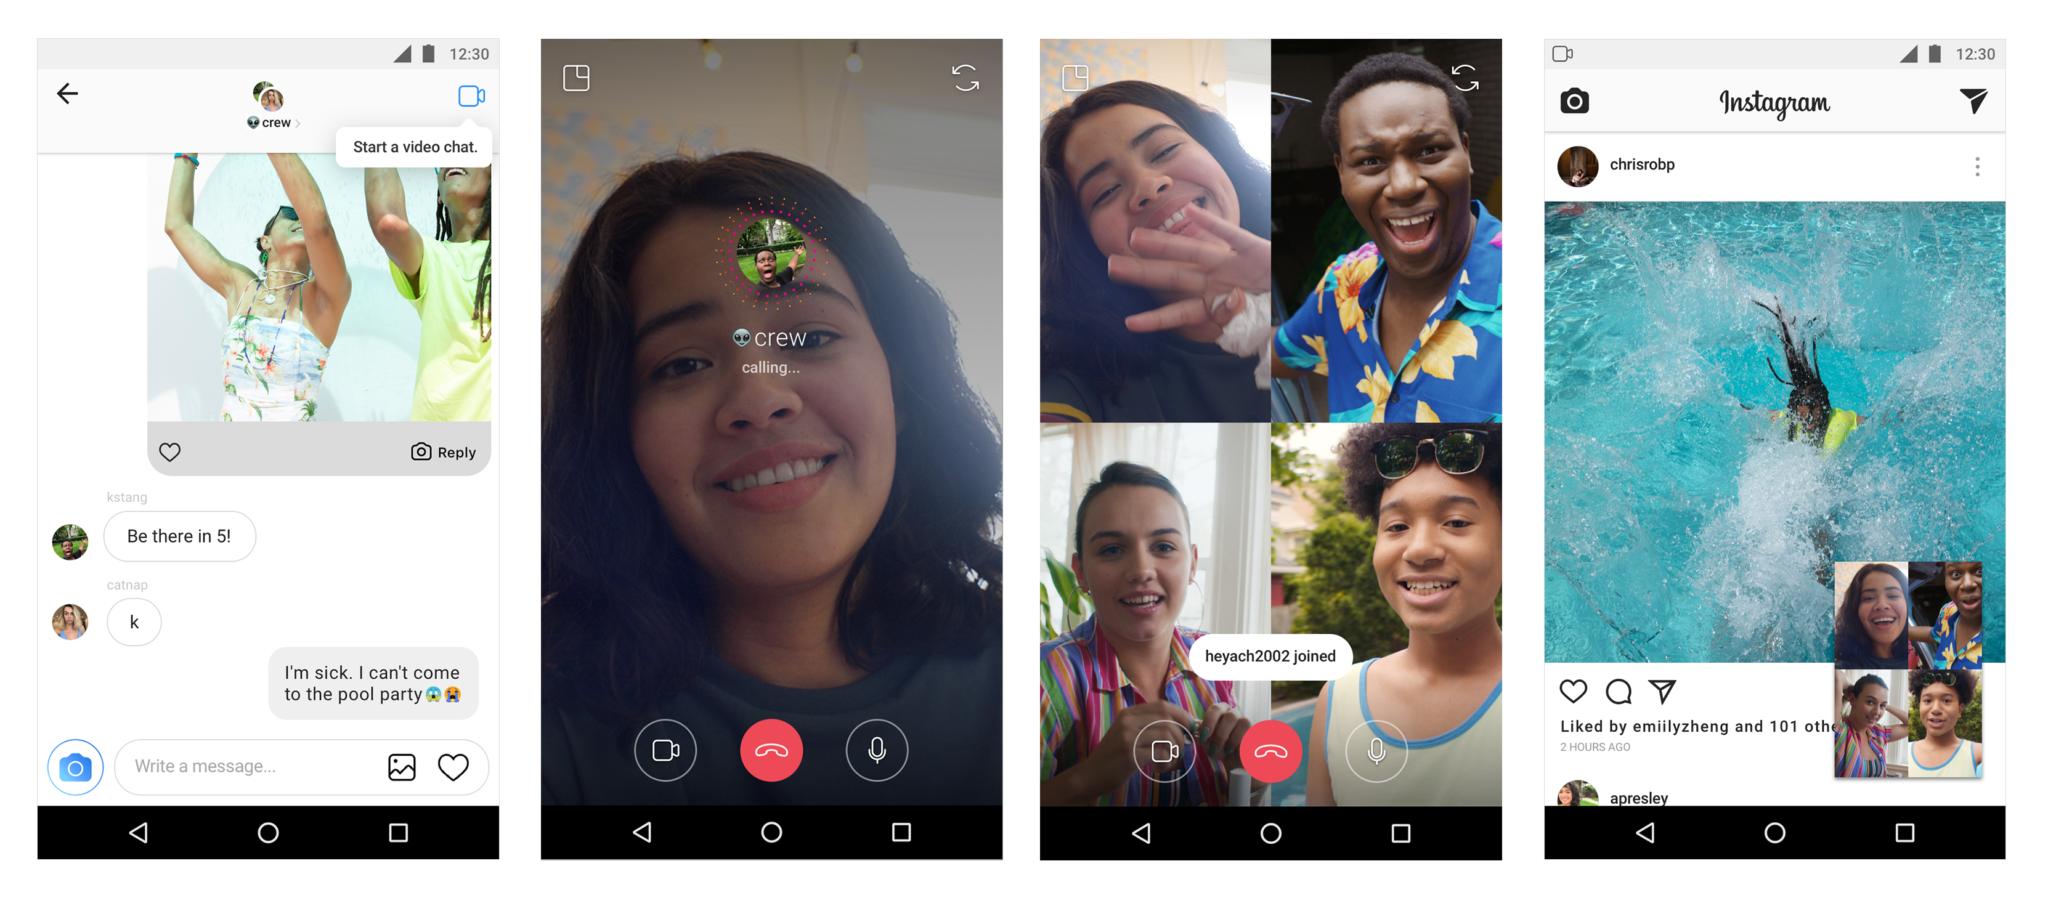 Skupinový video chat v službe Instagram